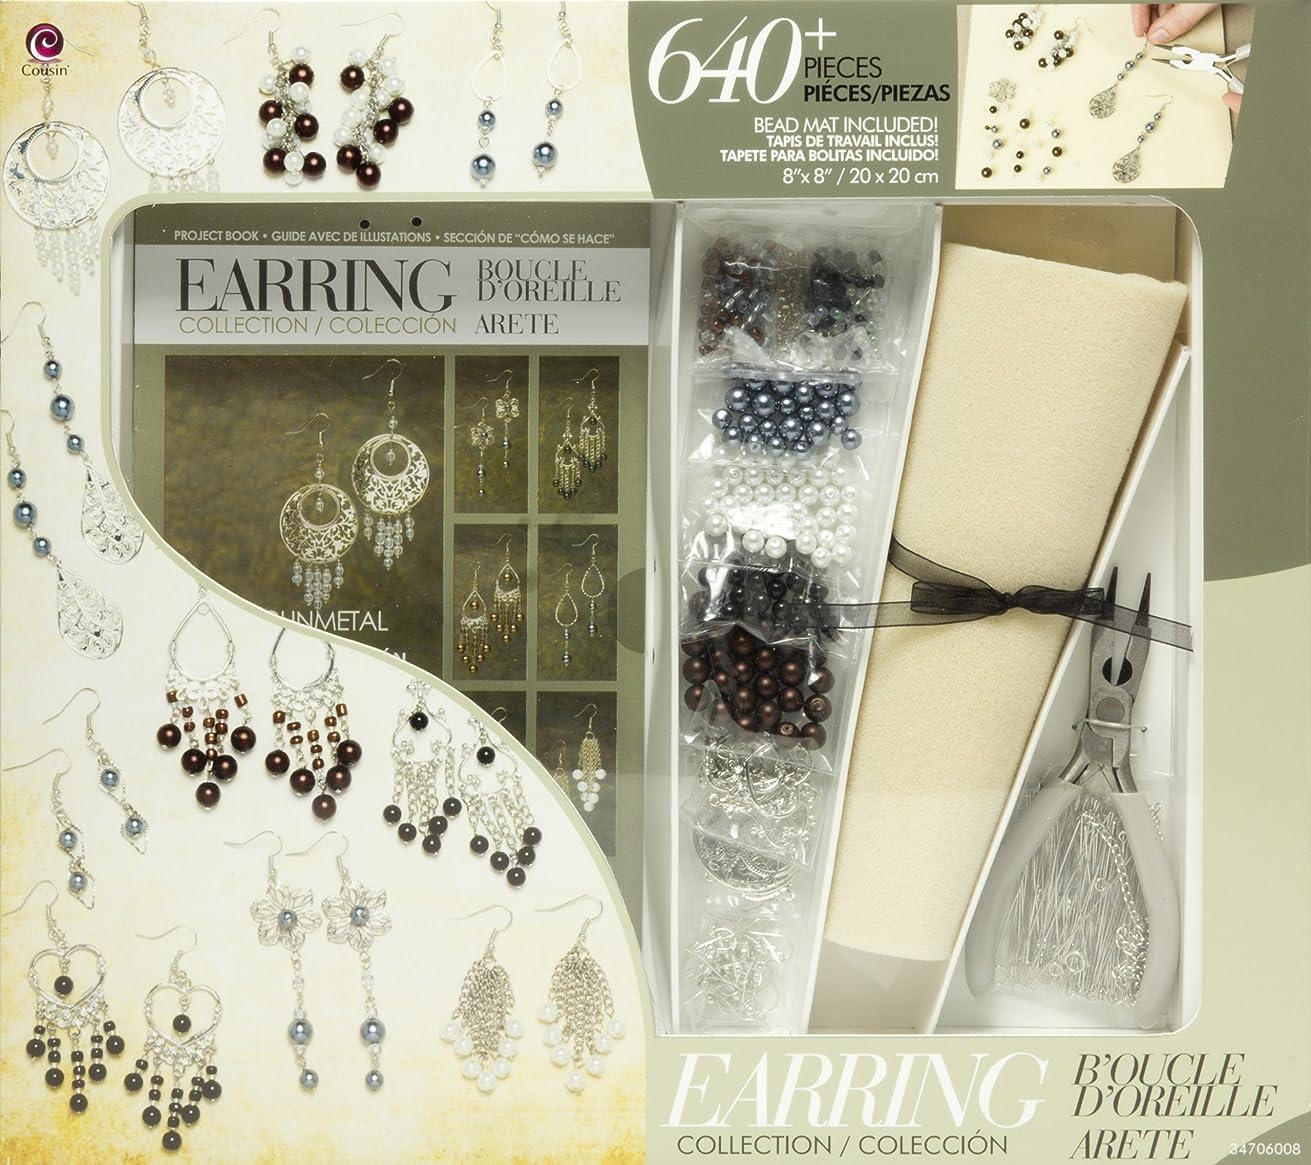 Jewelry Basics Class in a Box! Jewelry Making Kit